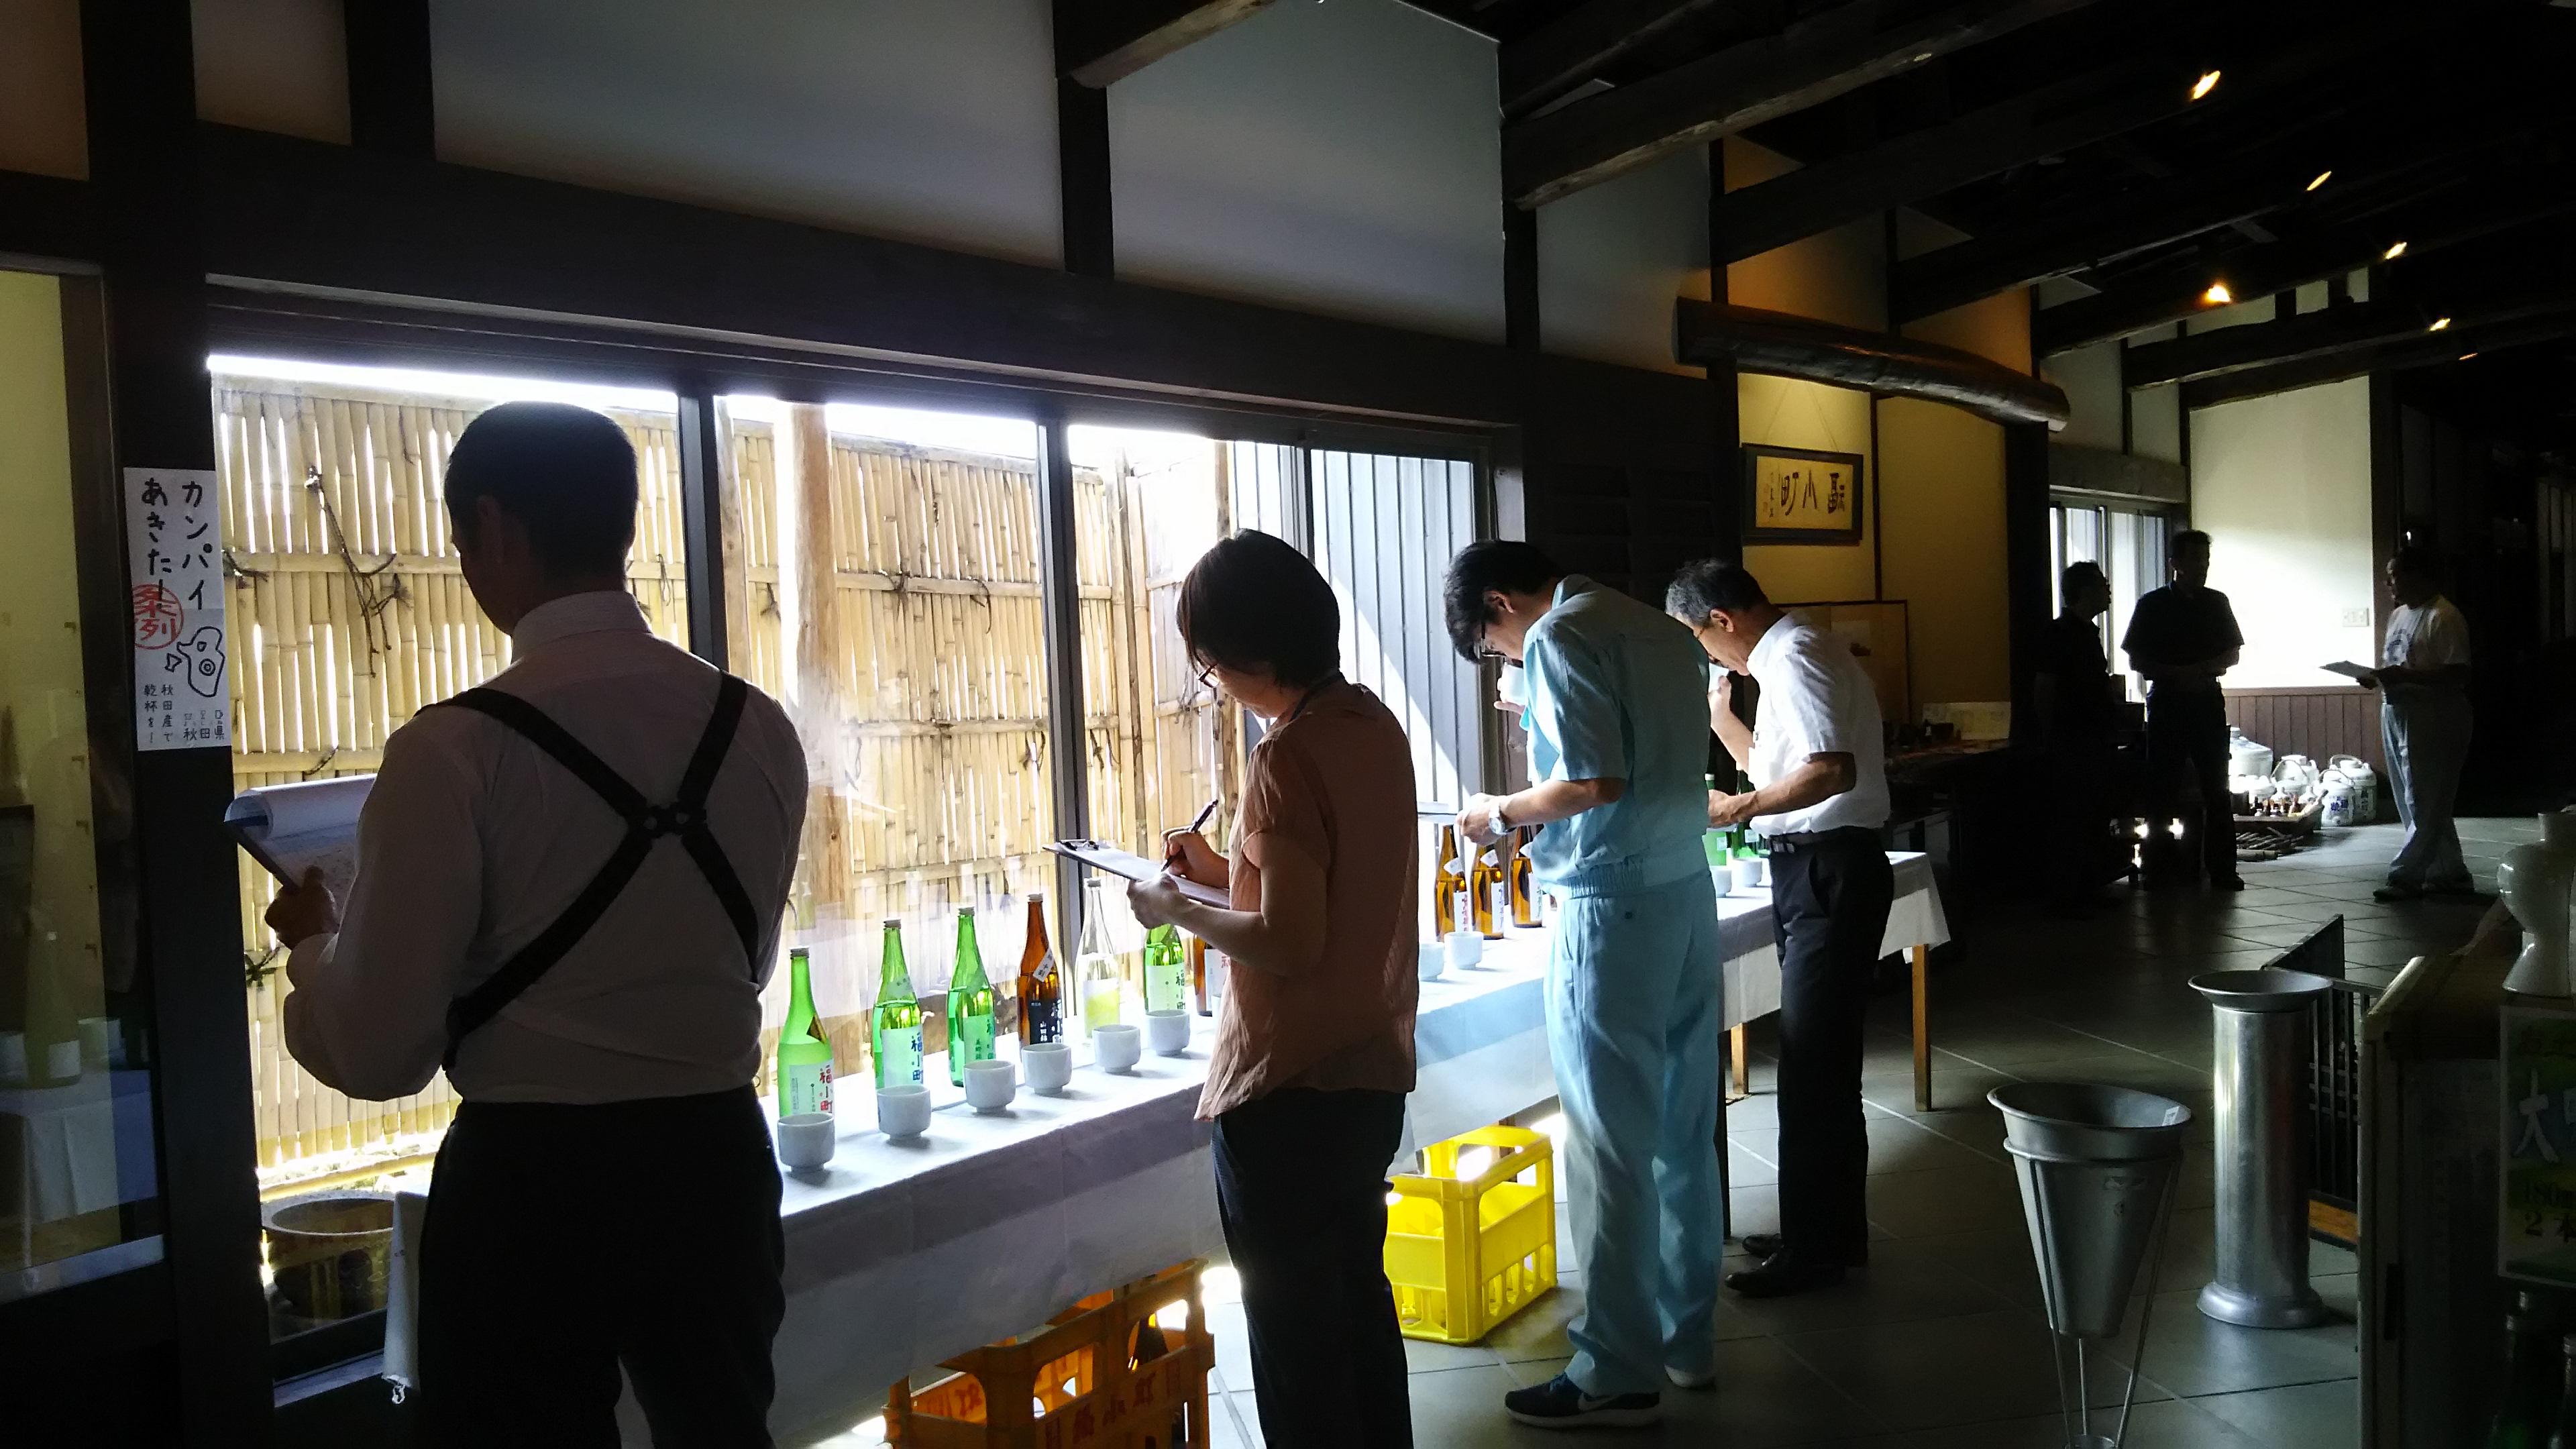 http://www.fukukomachi.com/blog/photo/DSC_0237.JPG